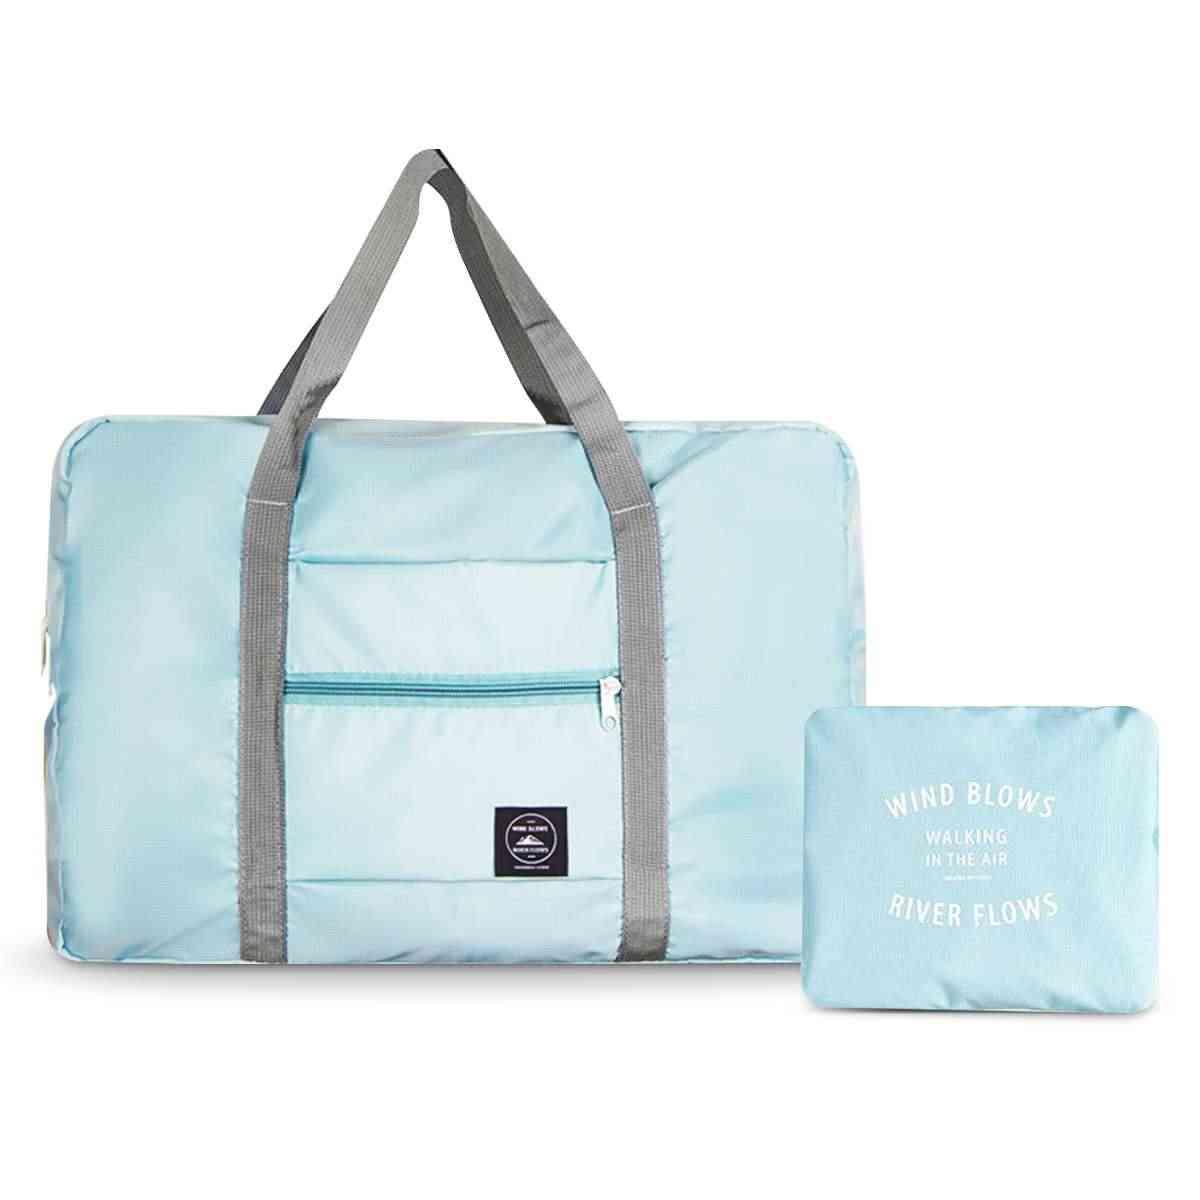 Waterproof Oxford Cloth Luggage Travel Bag